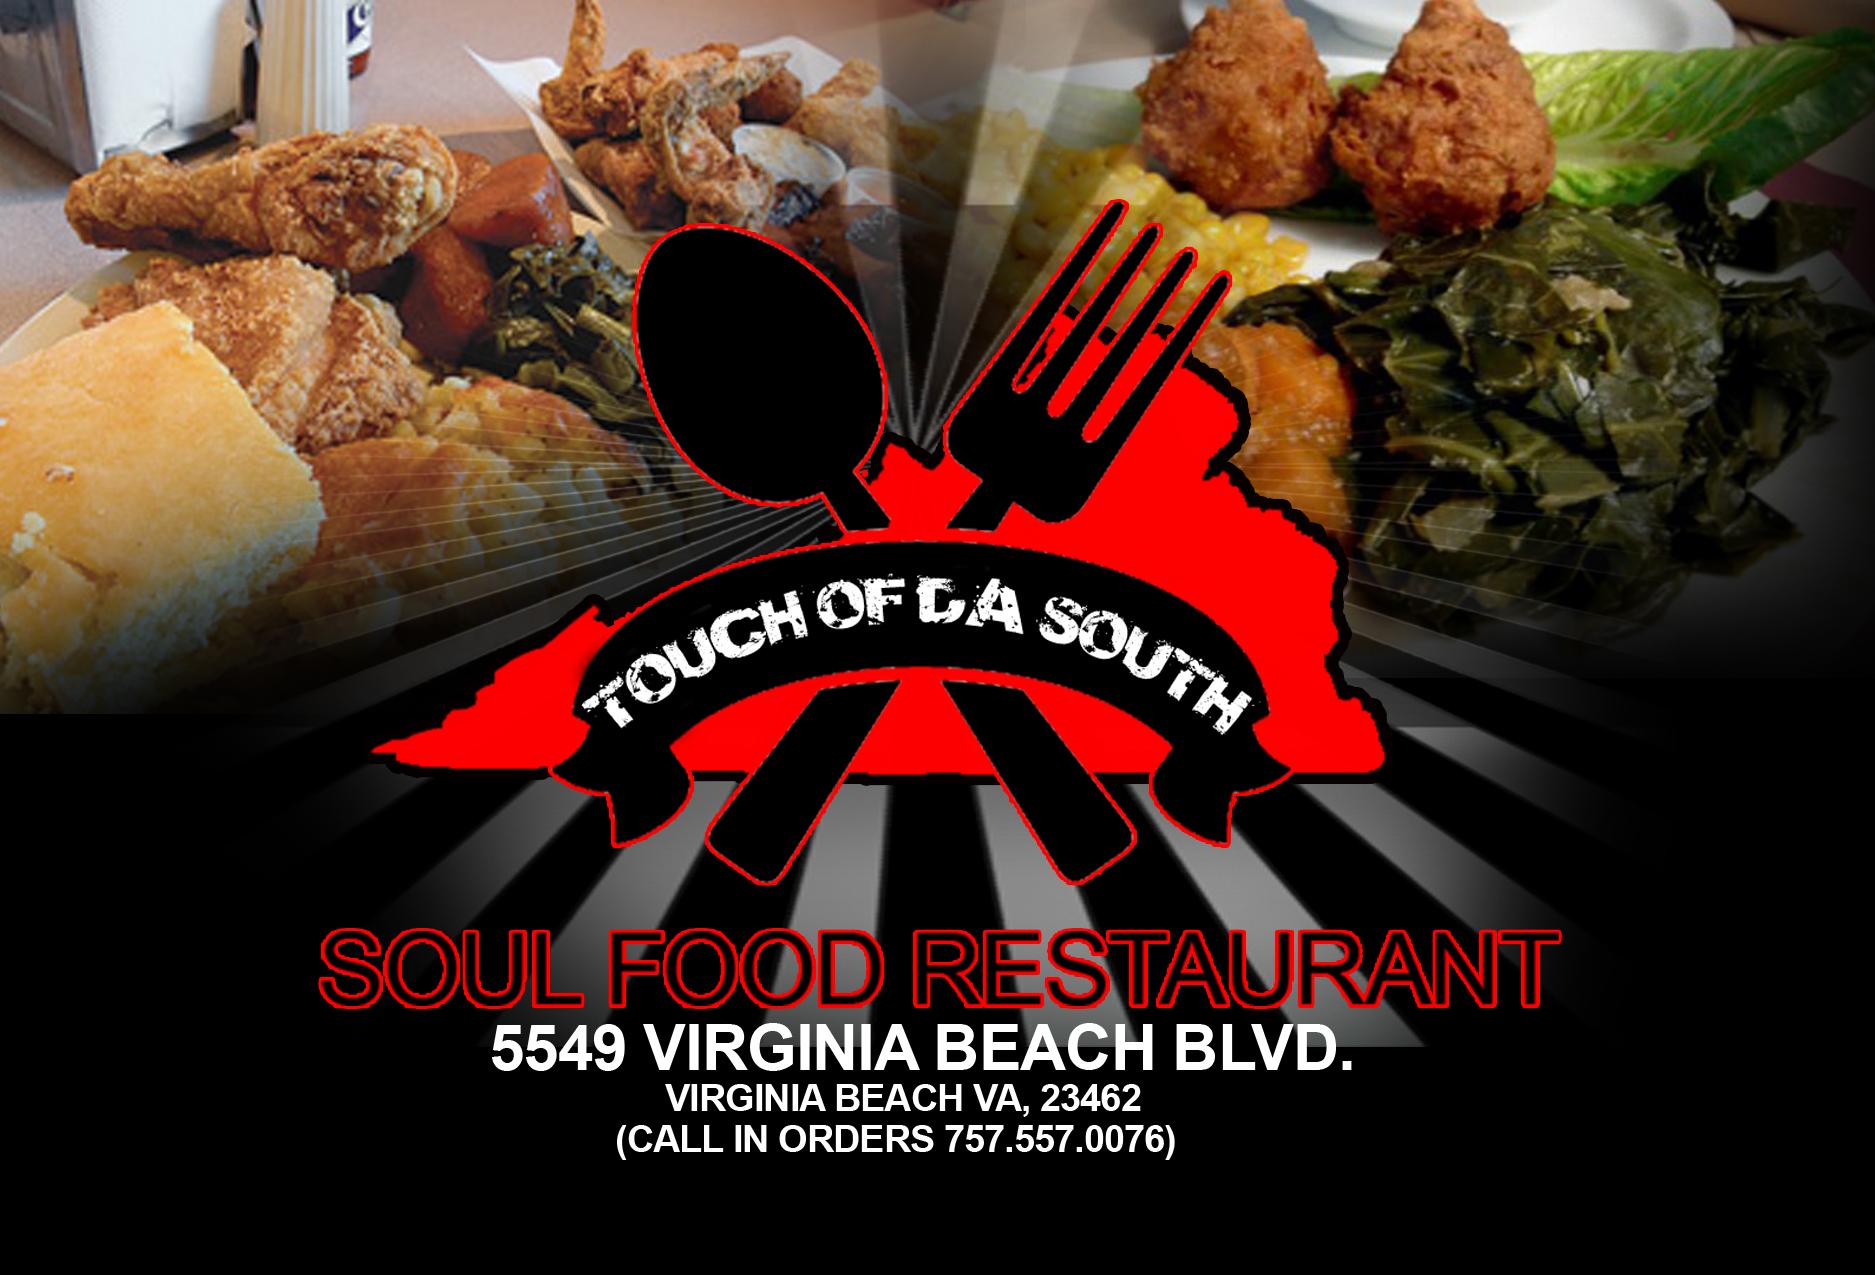 soul food flyers soul food flyers